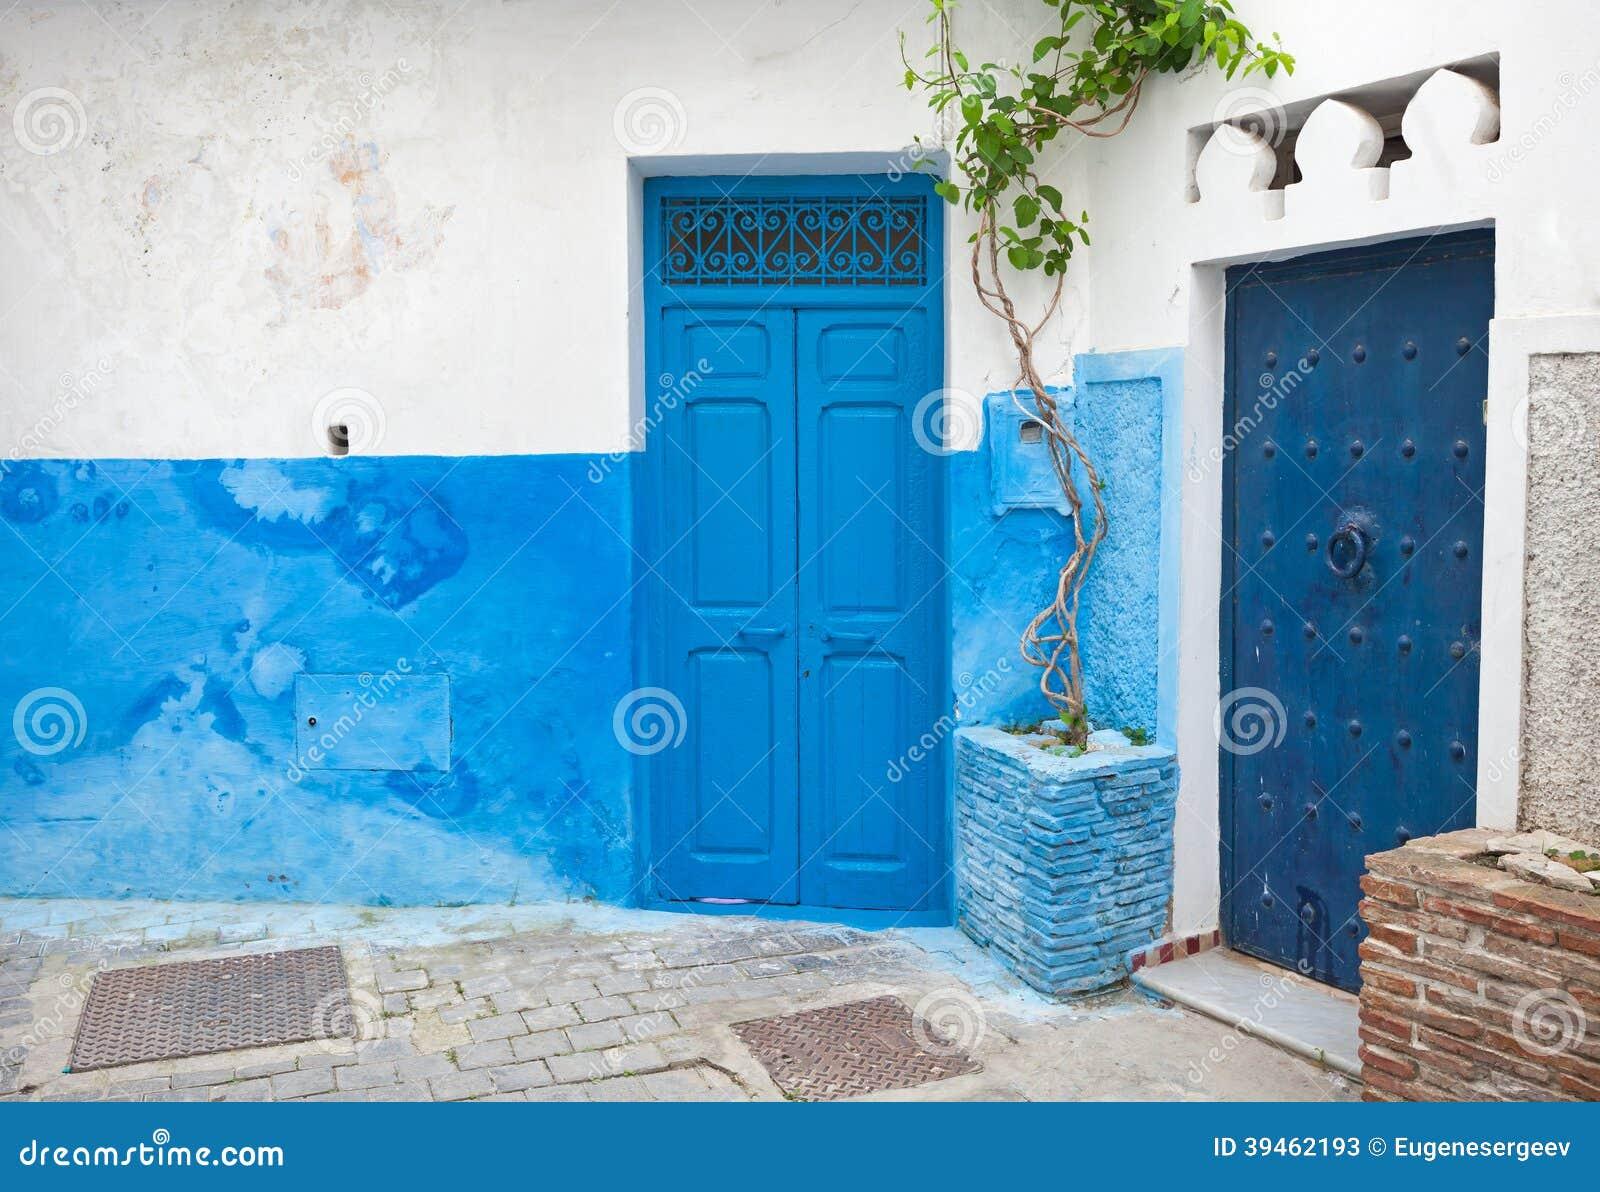 Puertas azules y paredes blancas t nger marruecos imagen for Puertas y paredes blancas